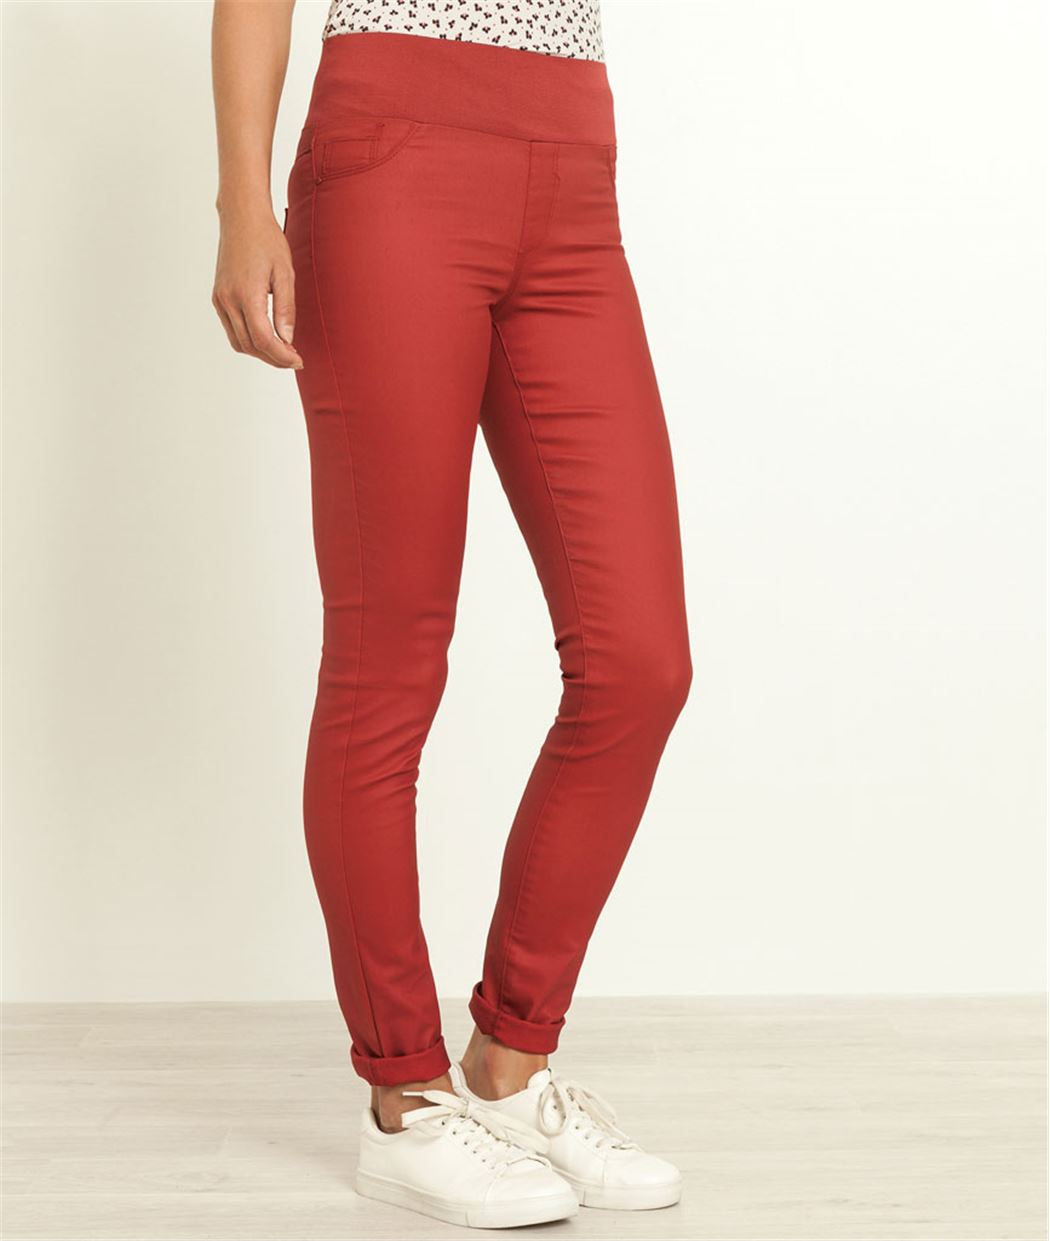 jegging femme enduit taille haute rouge grain de malice. Black Bedroom Furniture Sets. Home Design Ideas